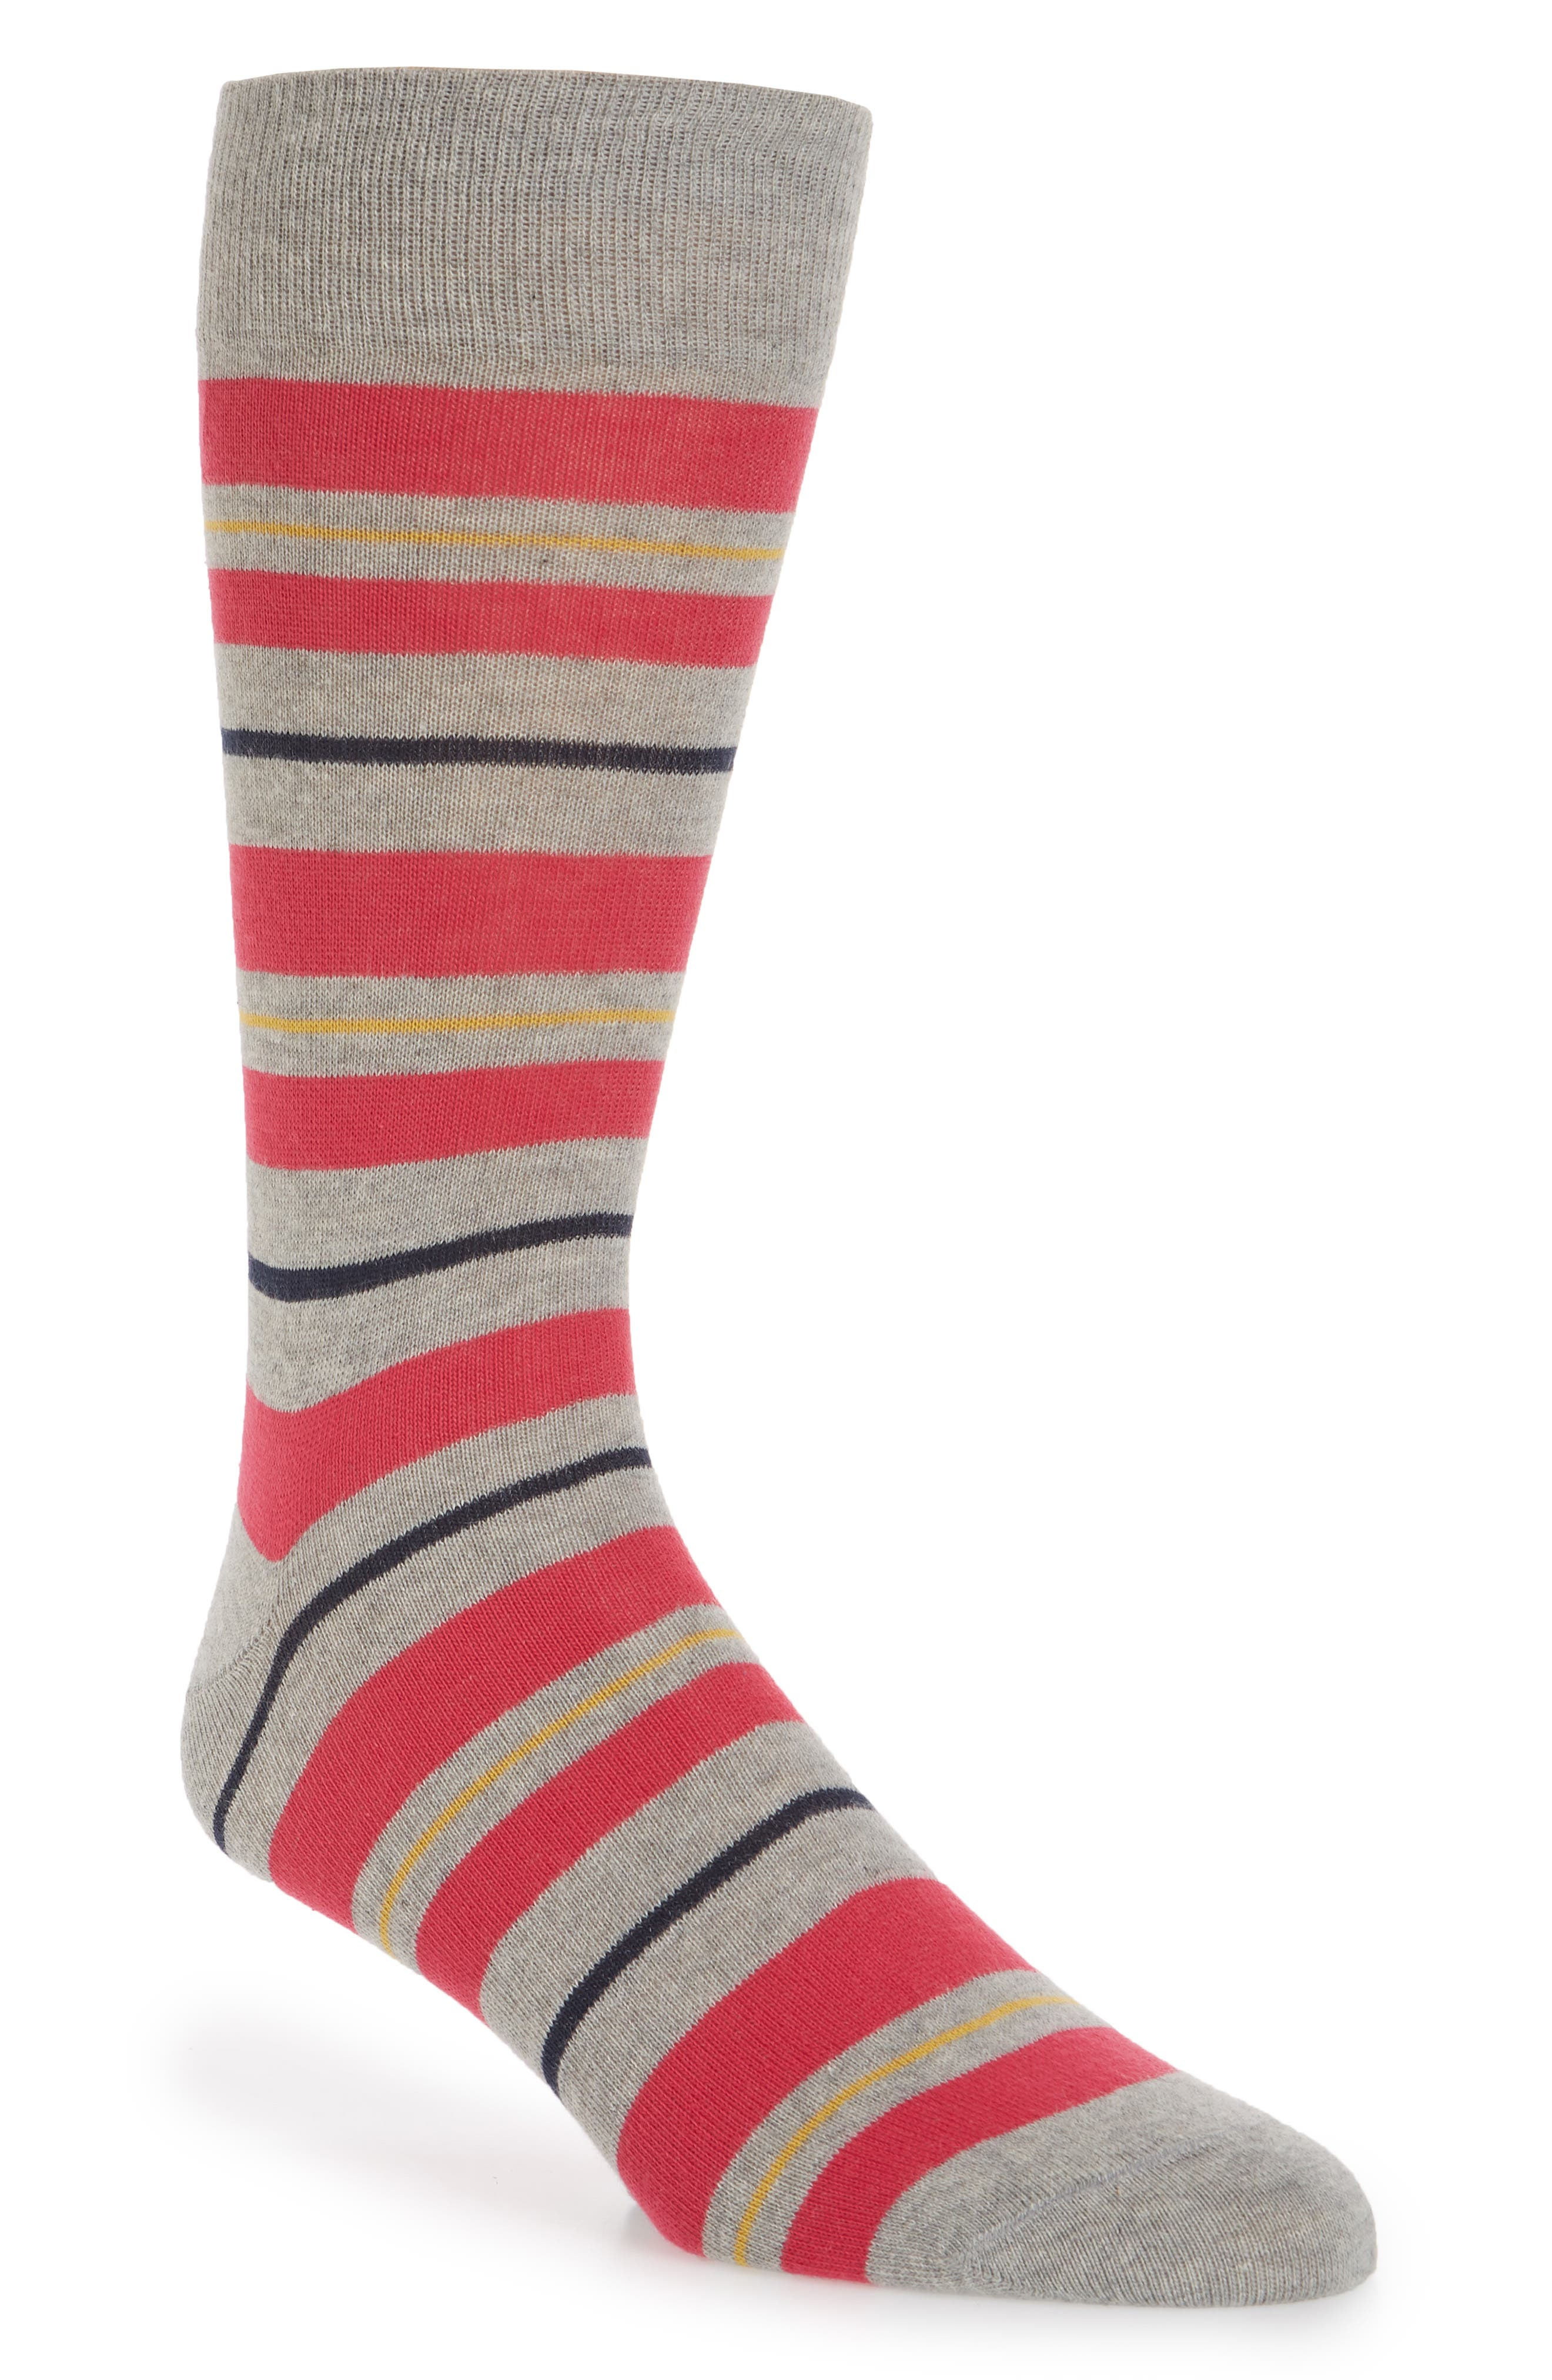 Uneven Stripe Socks,                             Main thumbnail 1, color,                             Light Grey